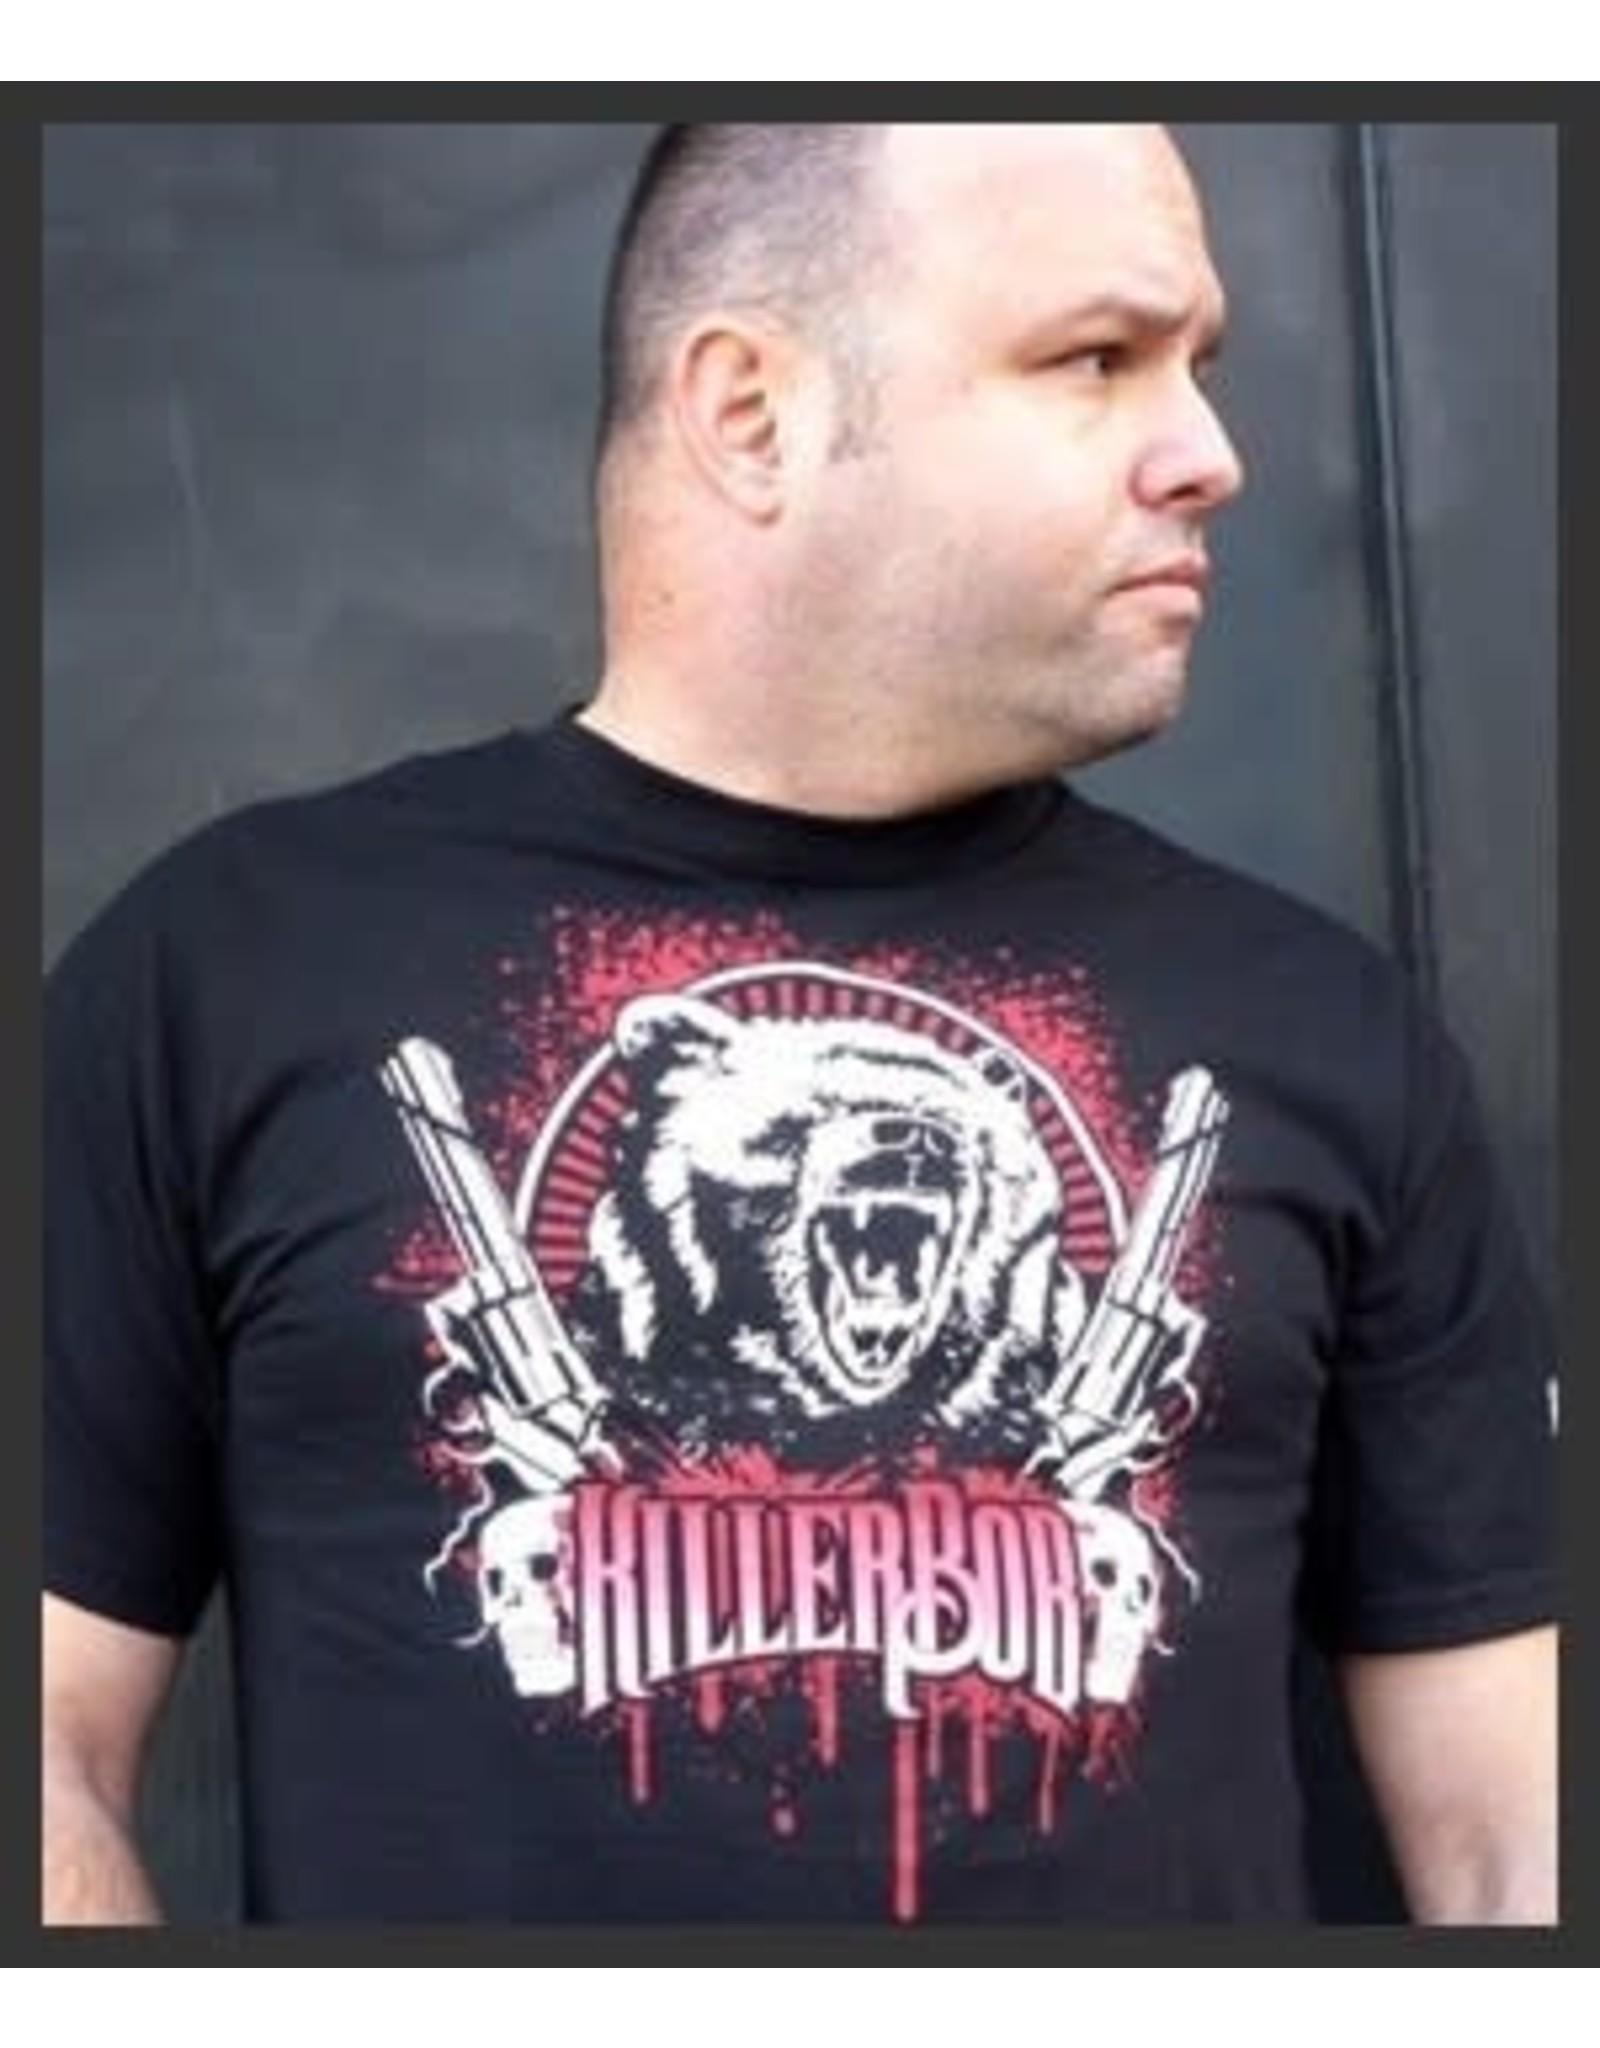 Killer Bob Graphics Killer Bob Graphics Label Whore